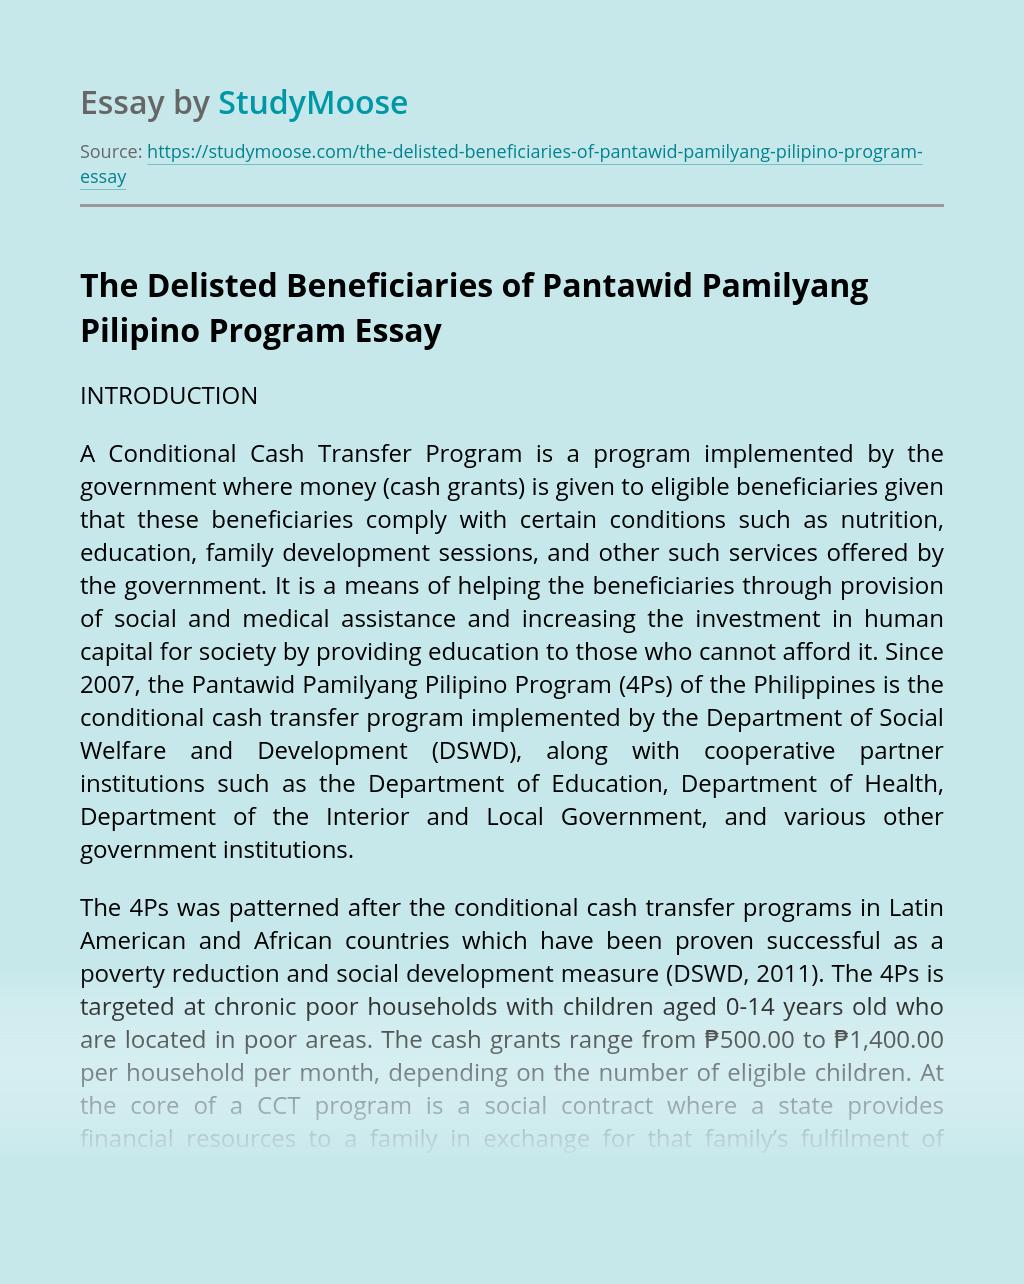 The Delisted Beneficiaries of Pantawid Pamilyang Pilipino Program